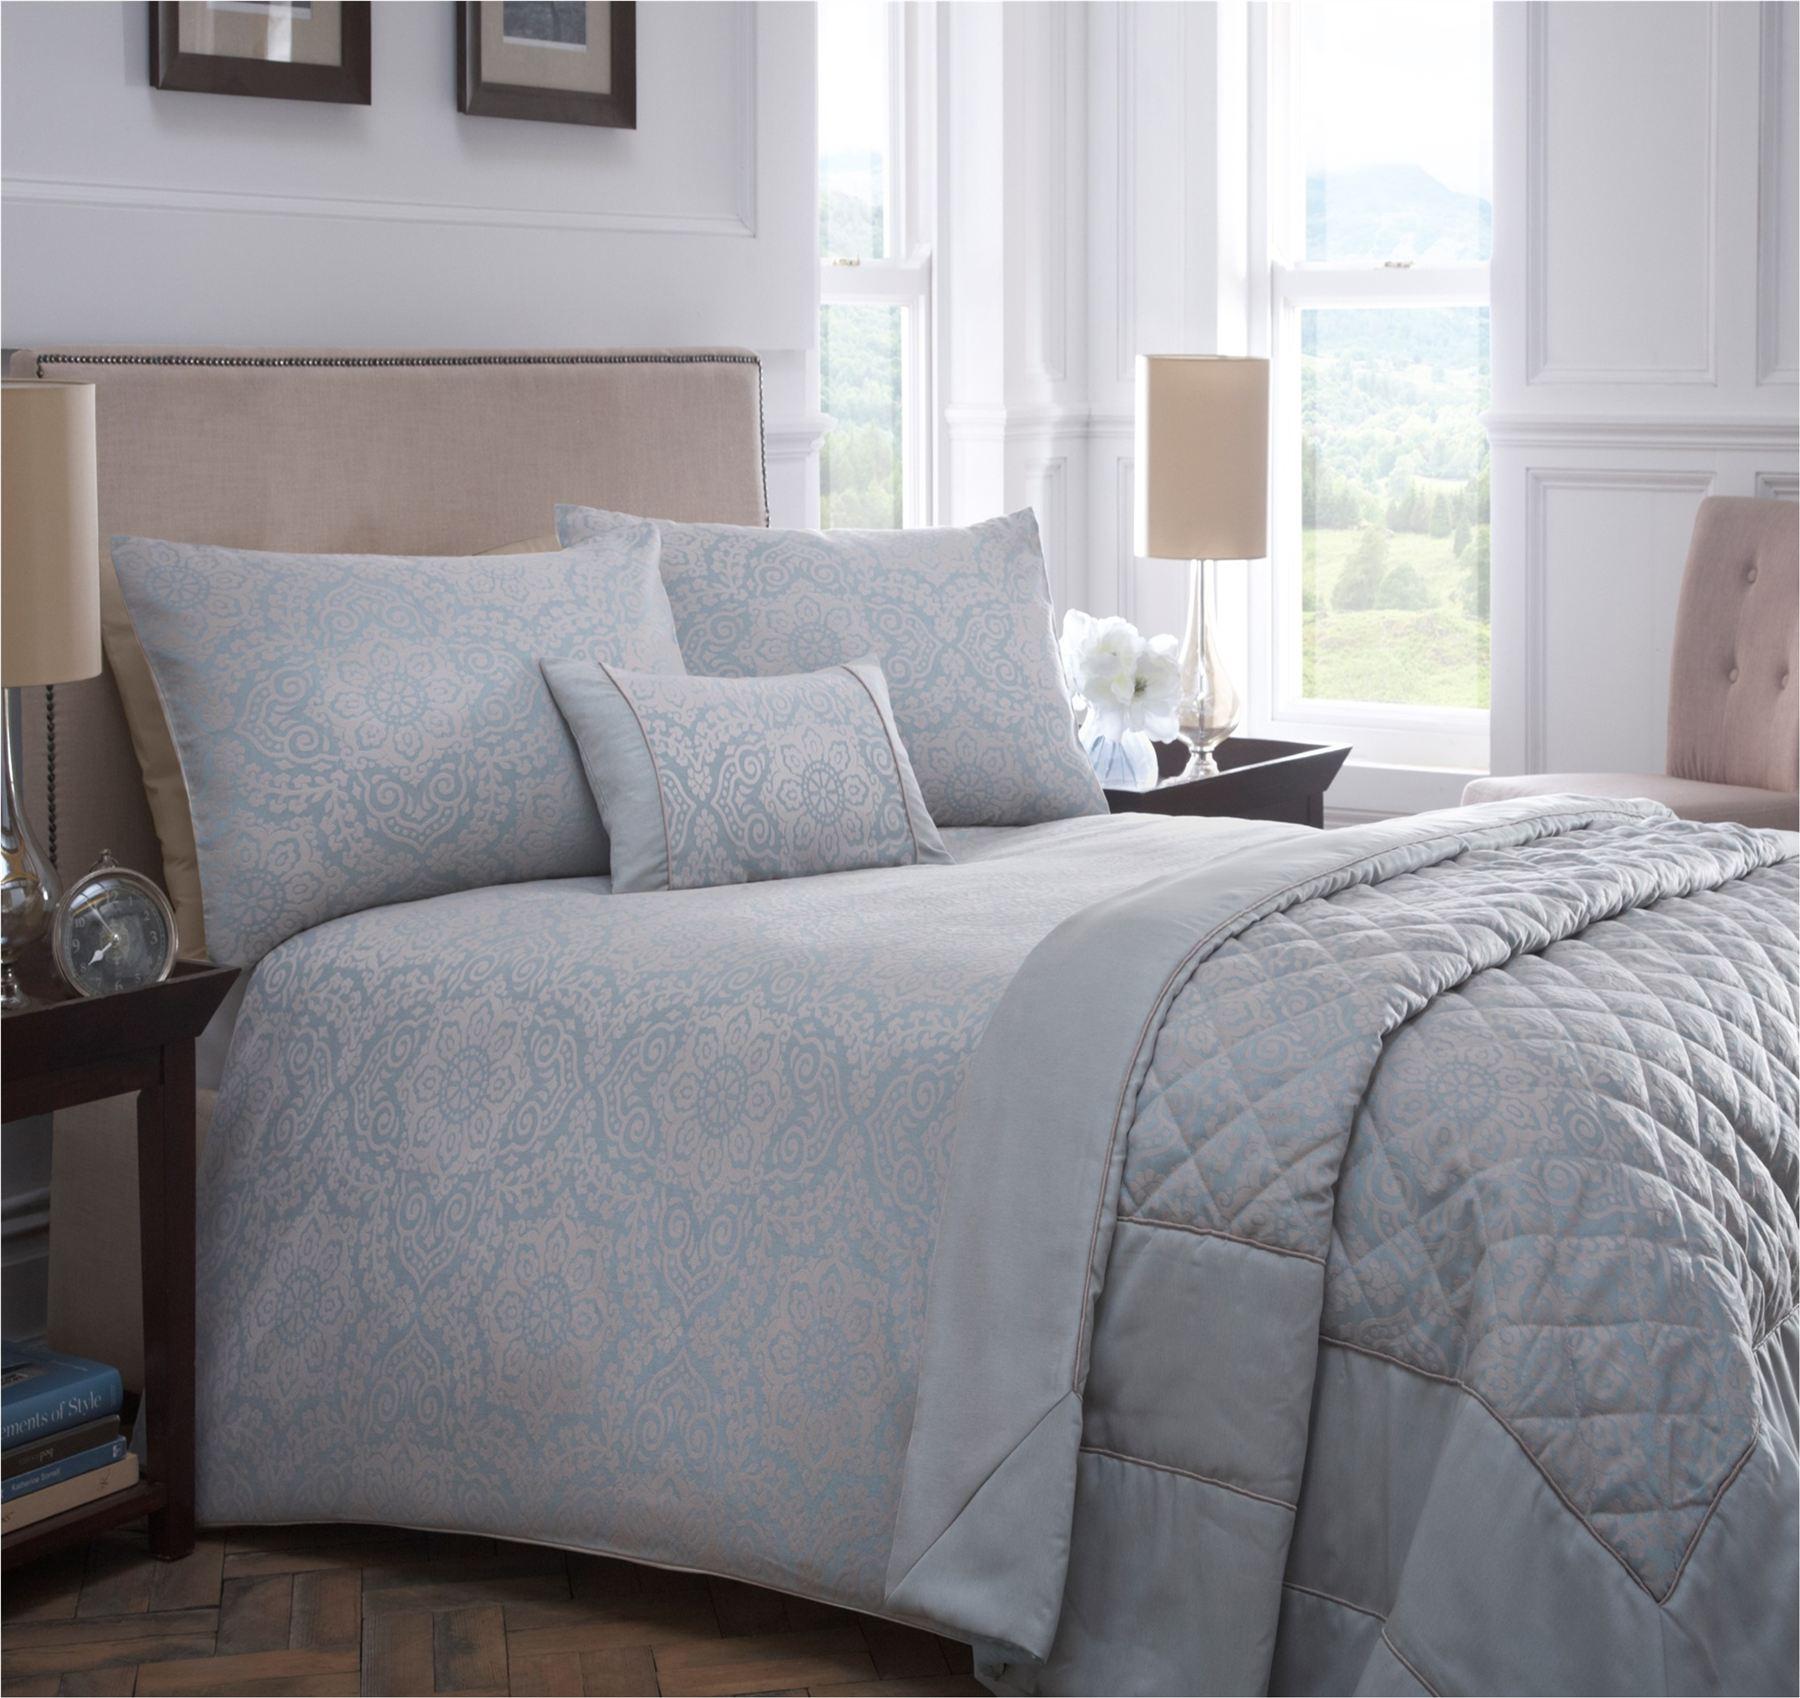 Luxury woven jacquard quilt duvet cover bedding bed linen sets pink blue ivory ebay